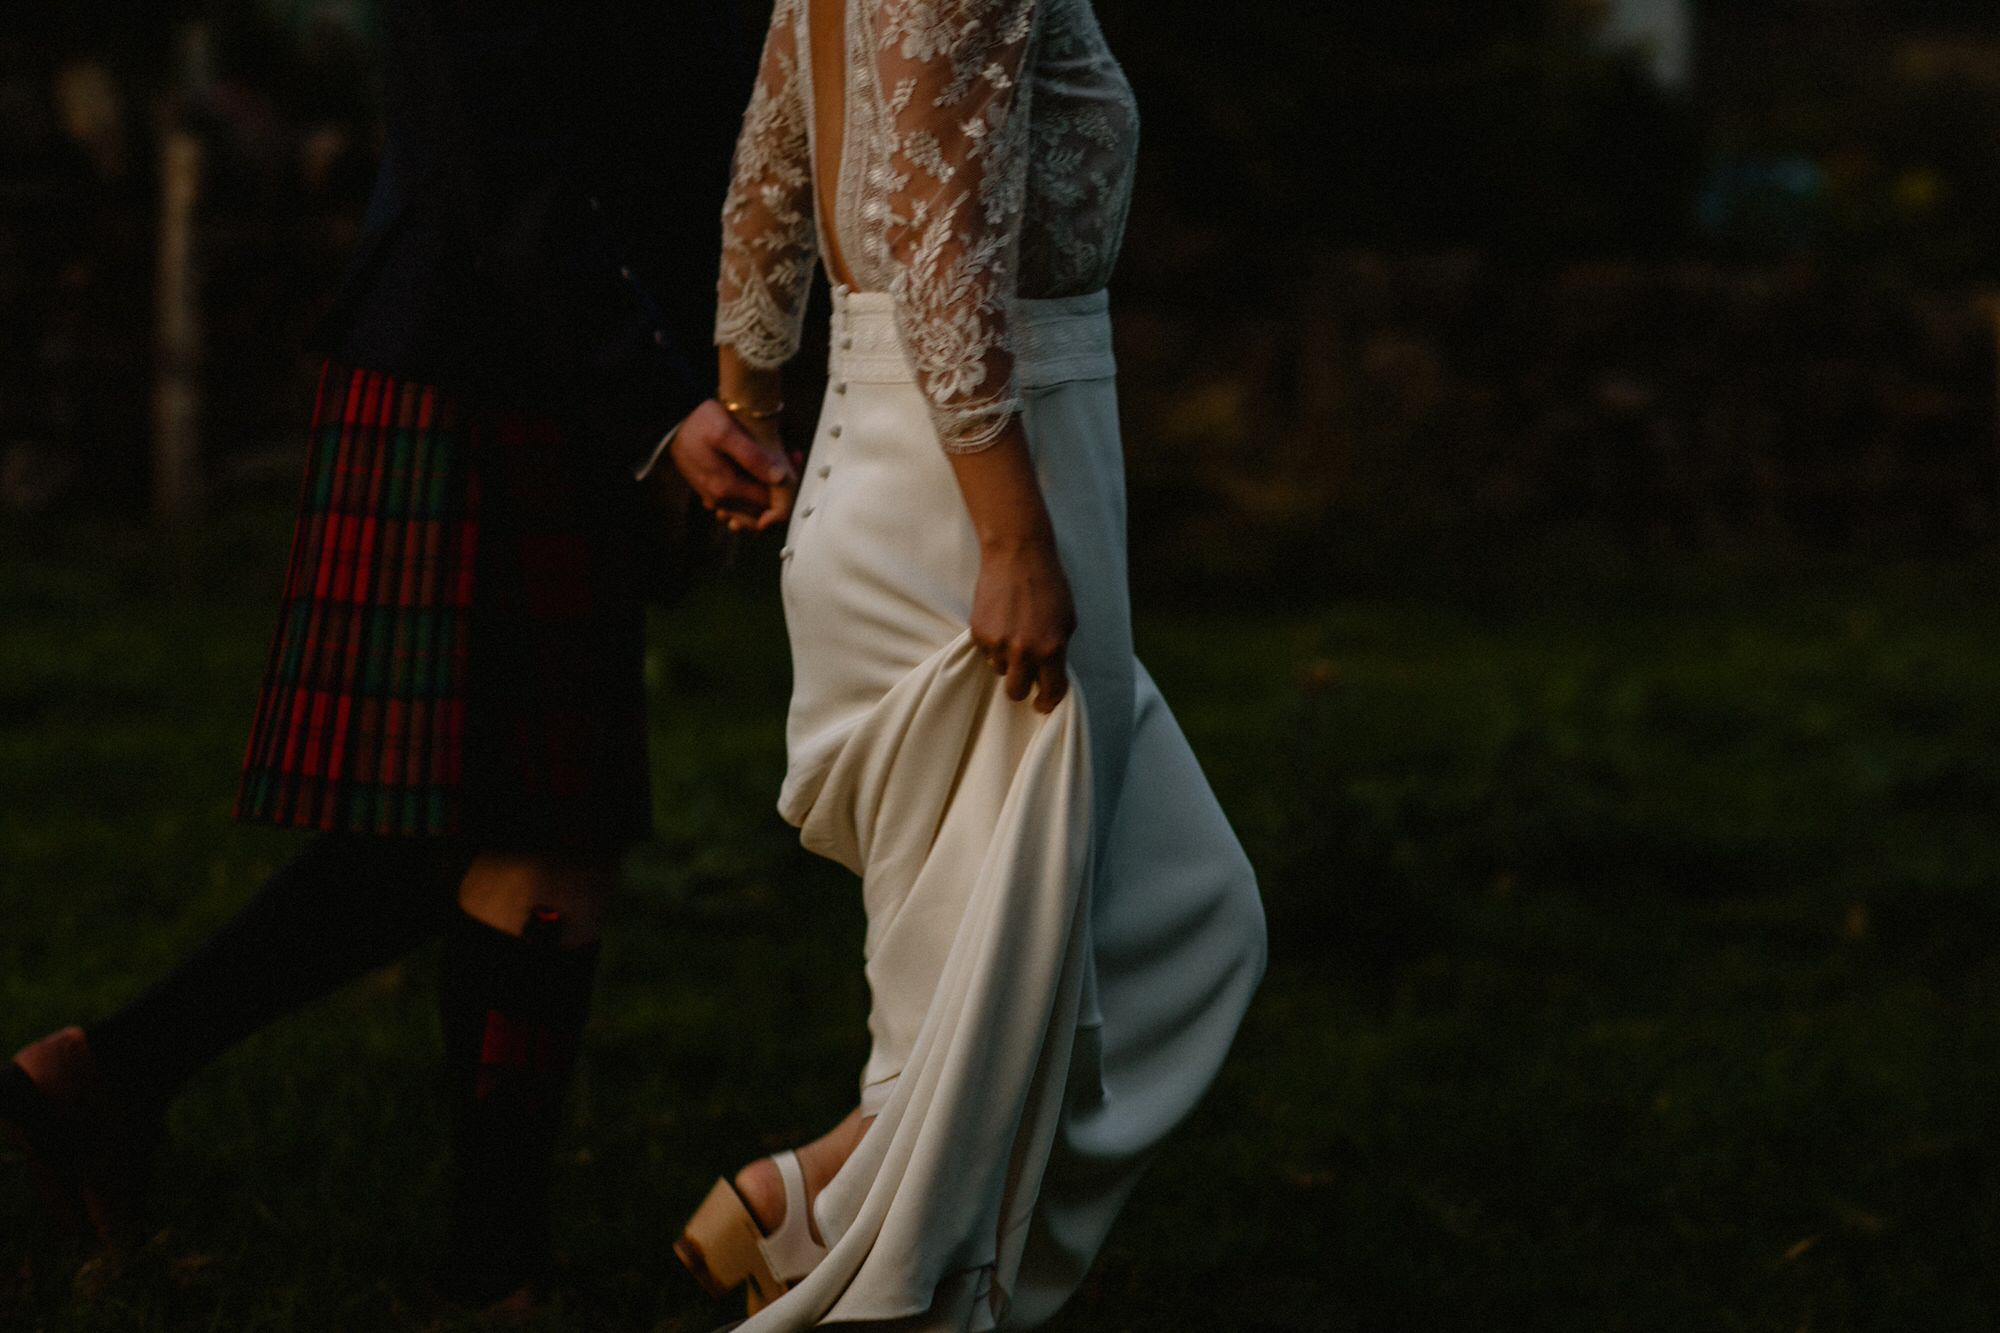 073 TIN SHED KNOCKRAICH WEDDING AUTUMN ZOE ALEXANDRA PHOTOGRAPHY